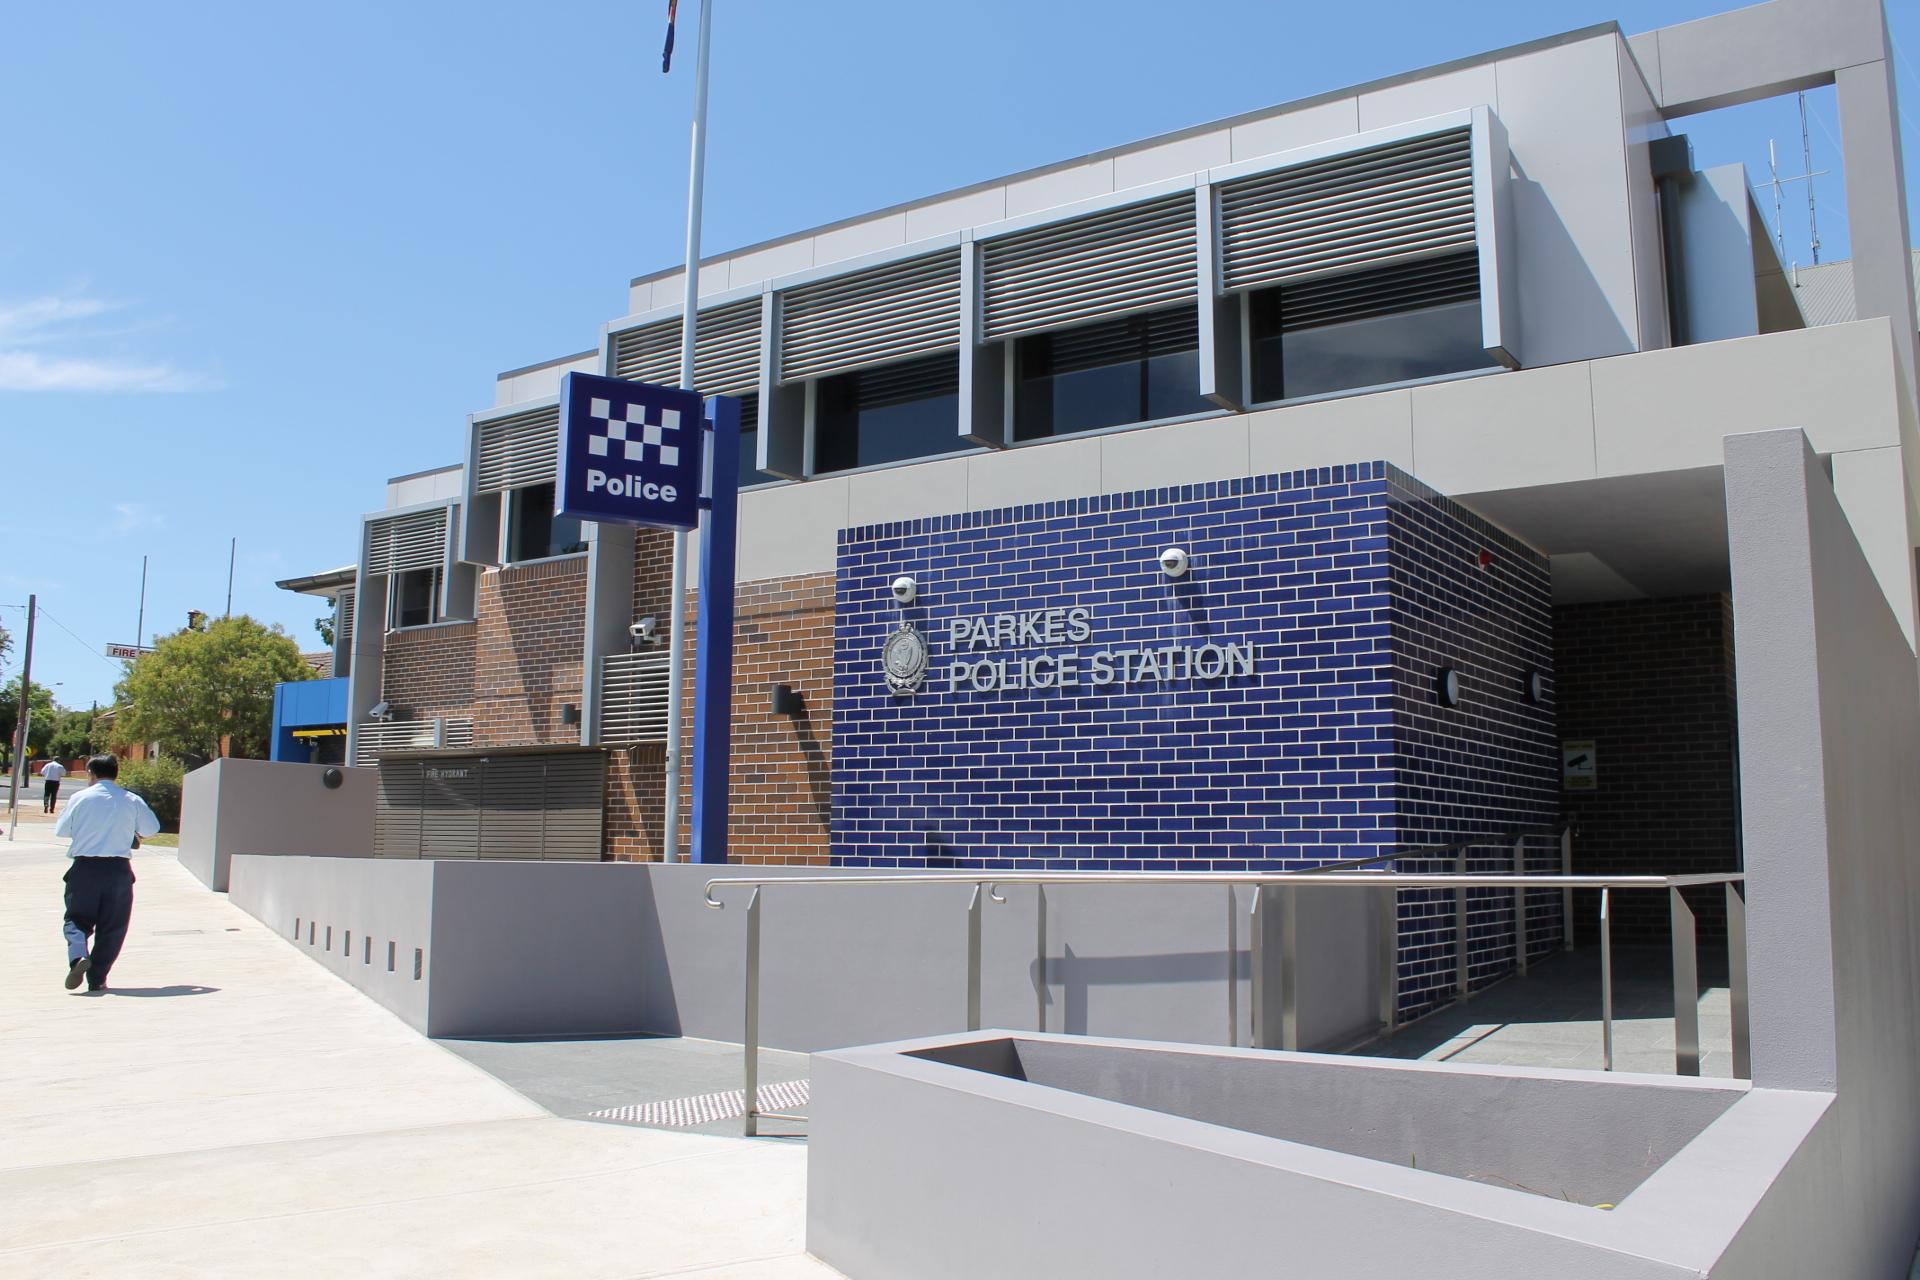 Parkes Police Station Exterior Facade – Gardner Wetherill GW 1